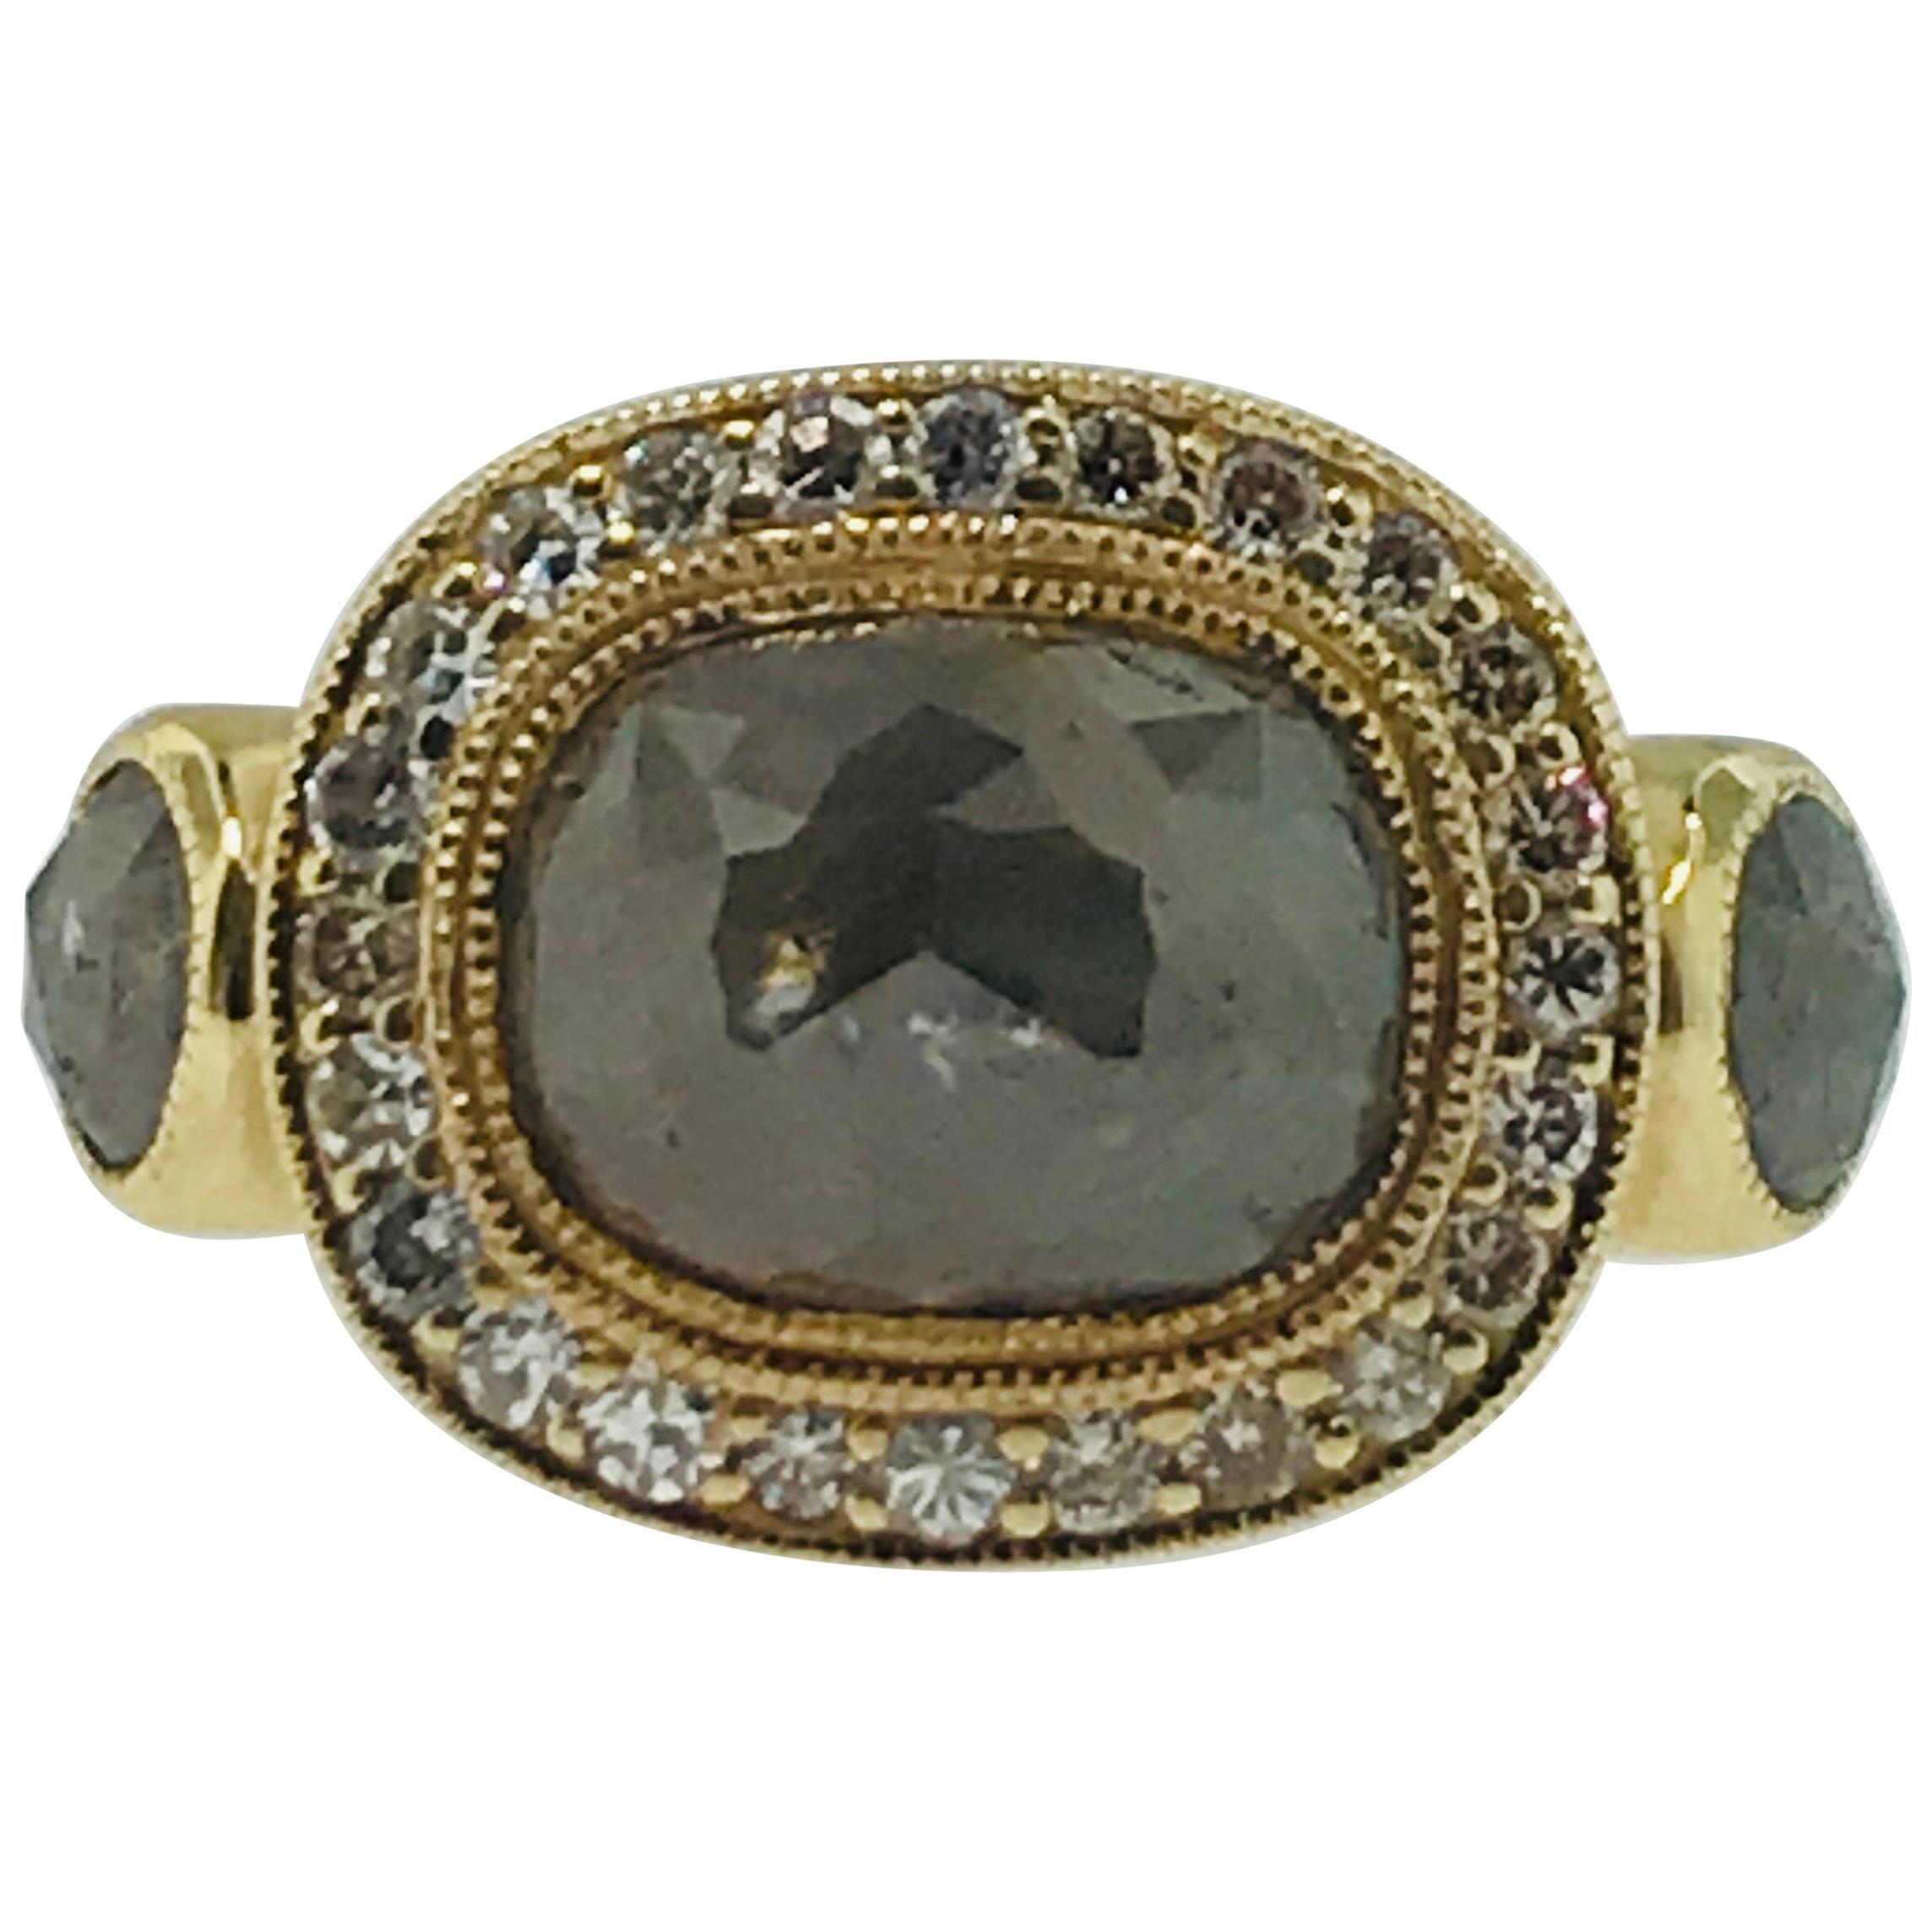 2 Carat Rose Cut Rough Diamond and 2.60 Carat Diamond Halo Engagement Ring